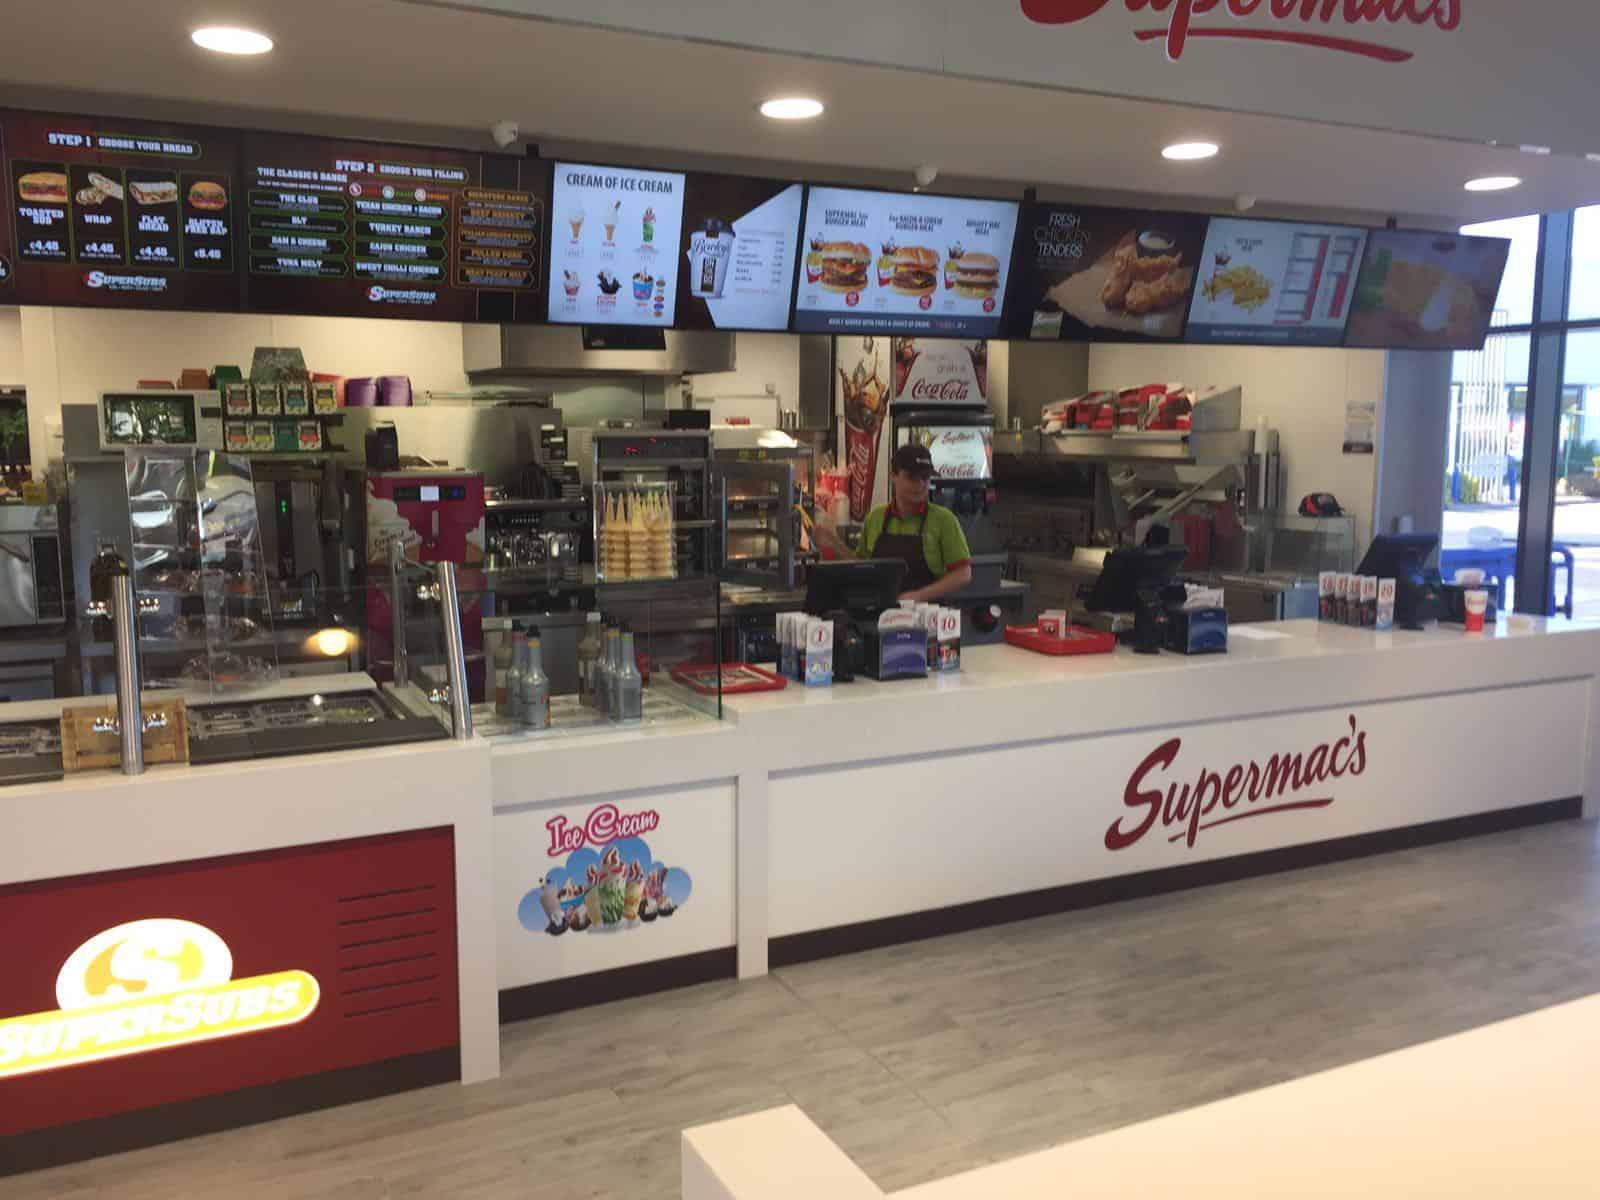 Martin Food Equipment f0bfc6cd-5cb1-498a-8786-bd7a24225945 Recent Installation at Supermacs Clarehall Dublin News